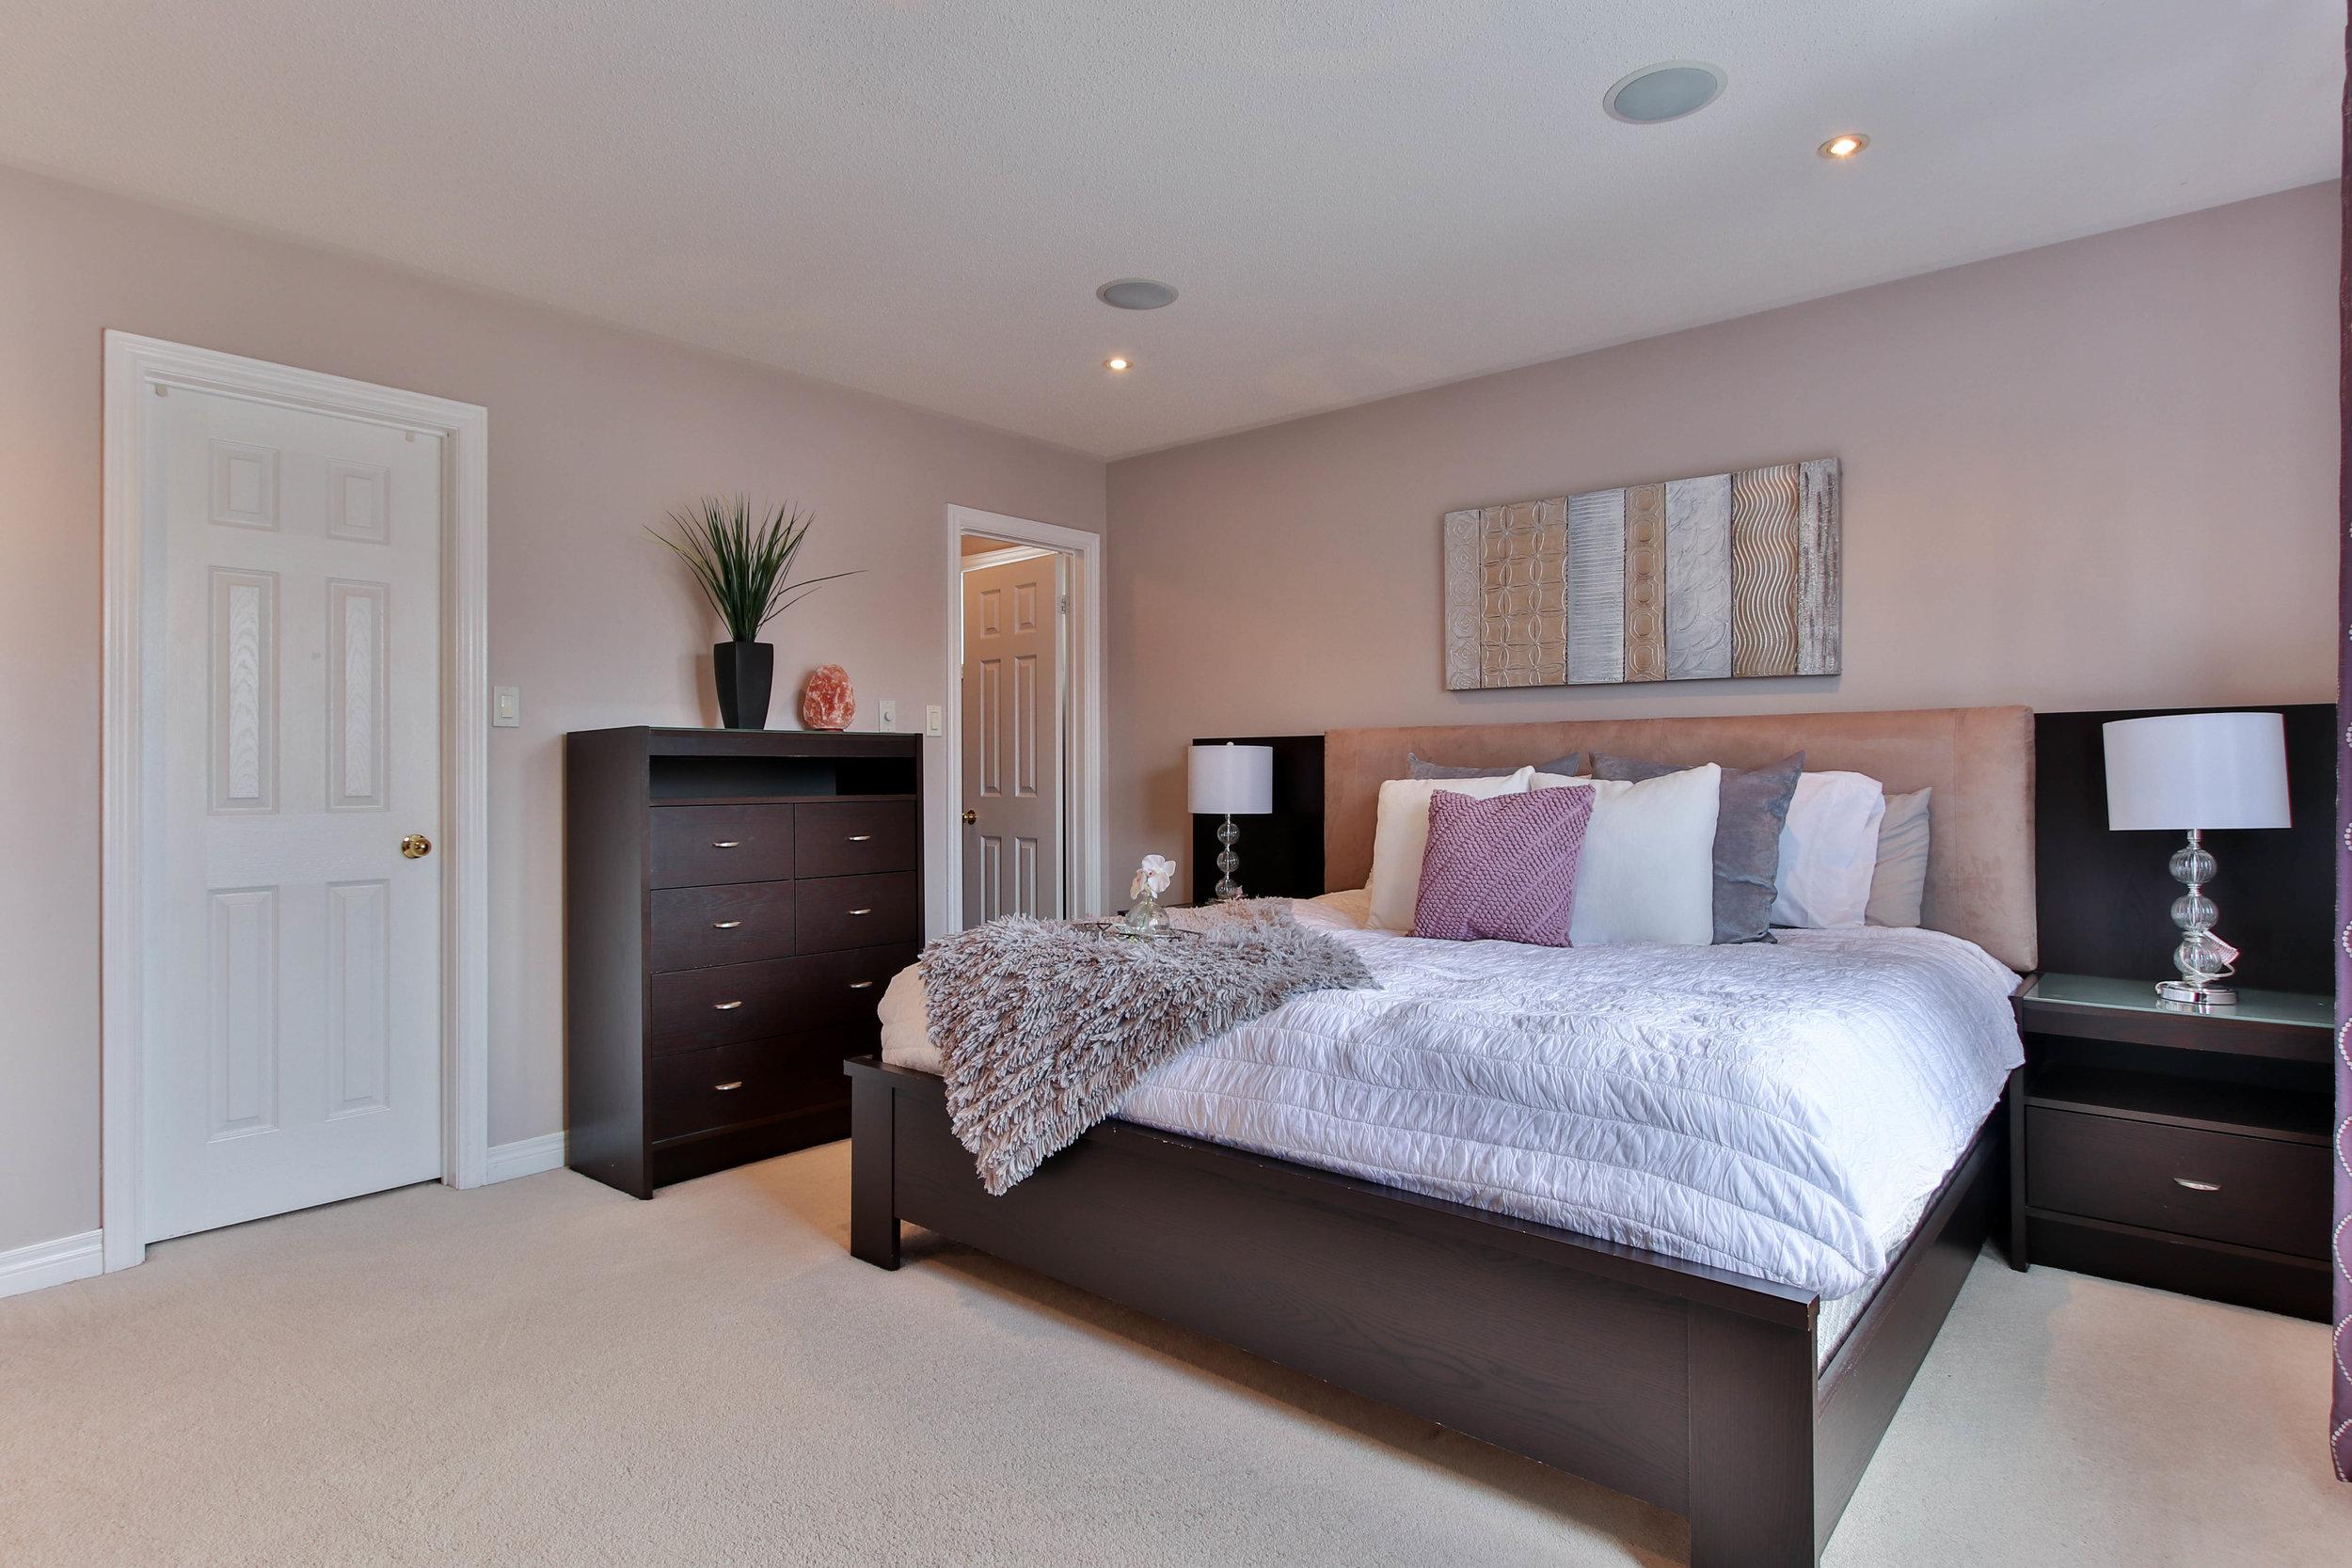 37_Bedroom (1 of 1).jpg